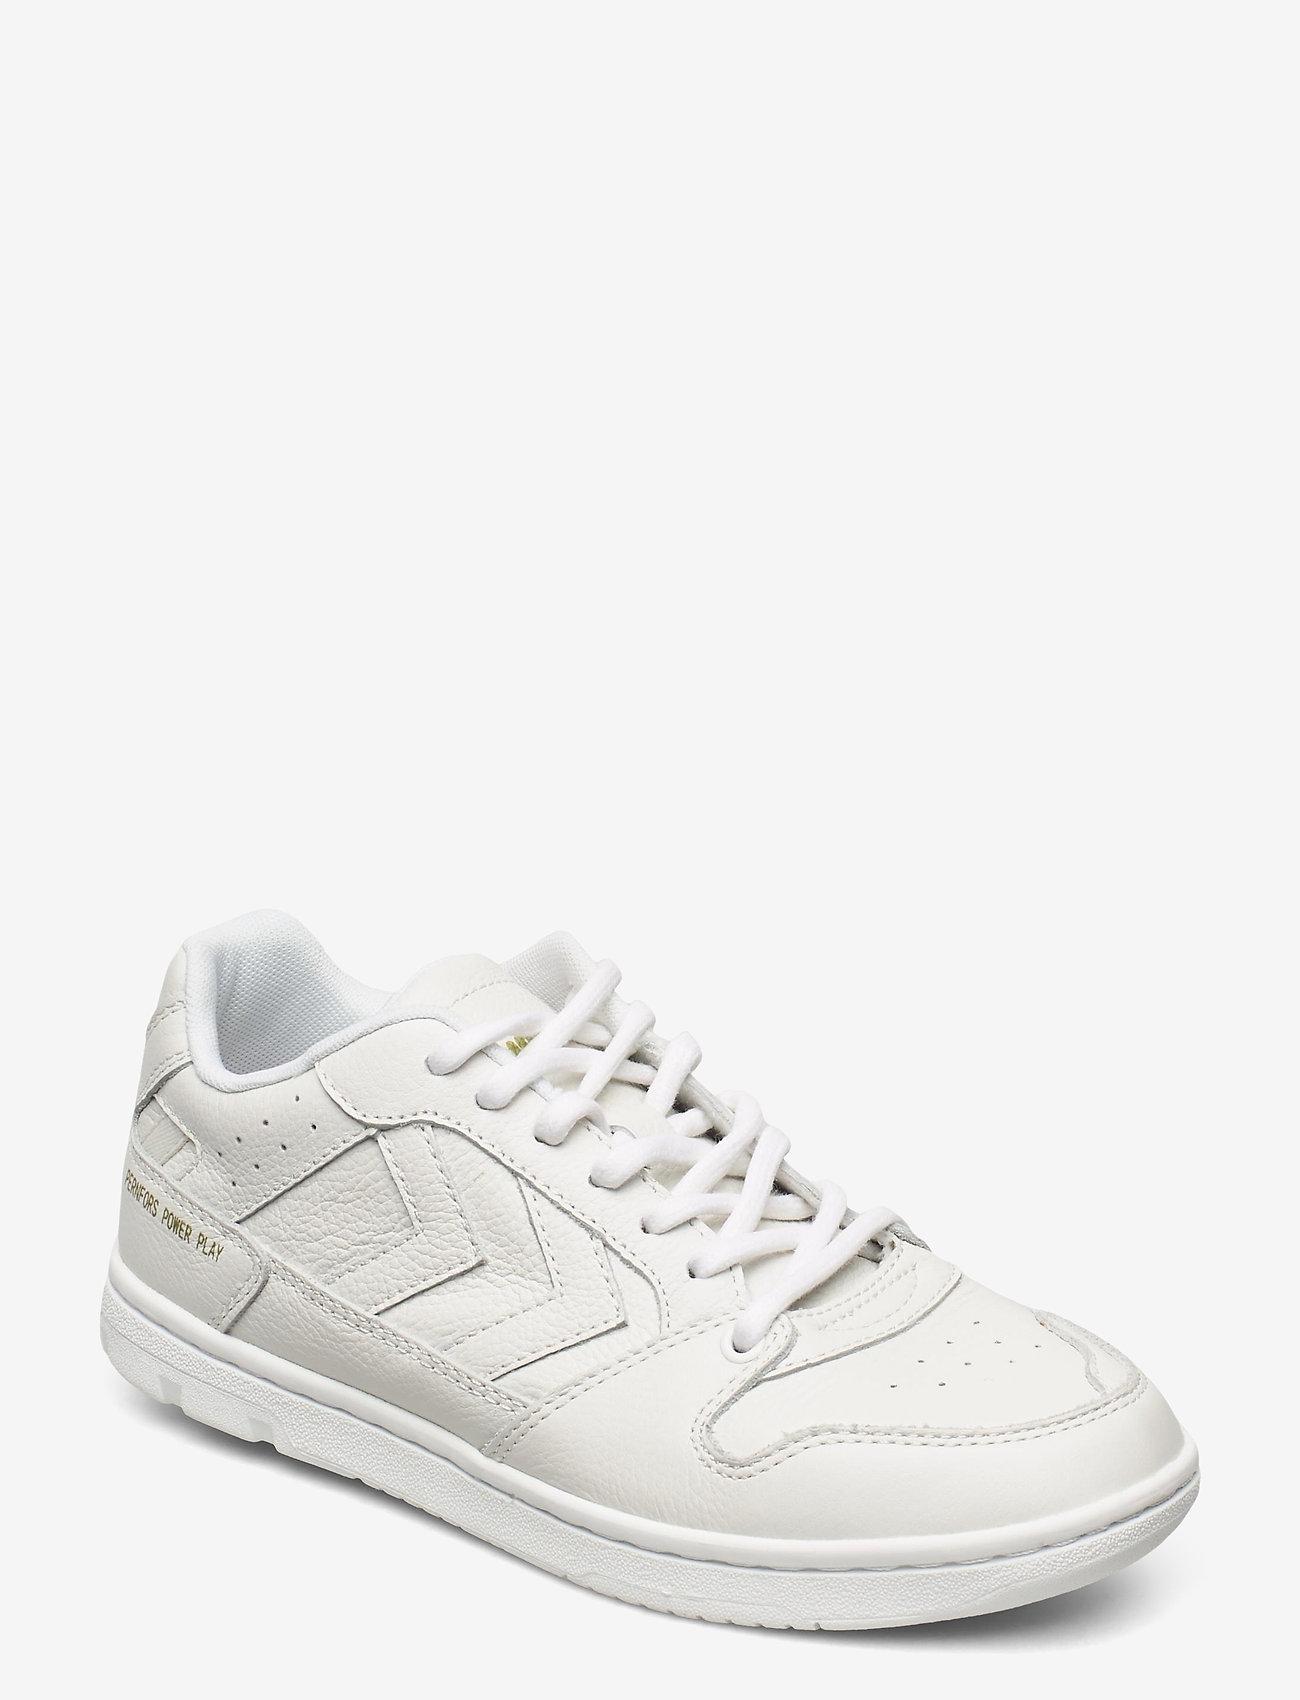 Hummel - POWER PLAY SNEAKER - laag sneakers - white - 1